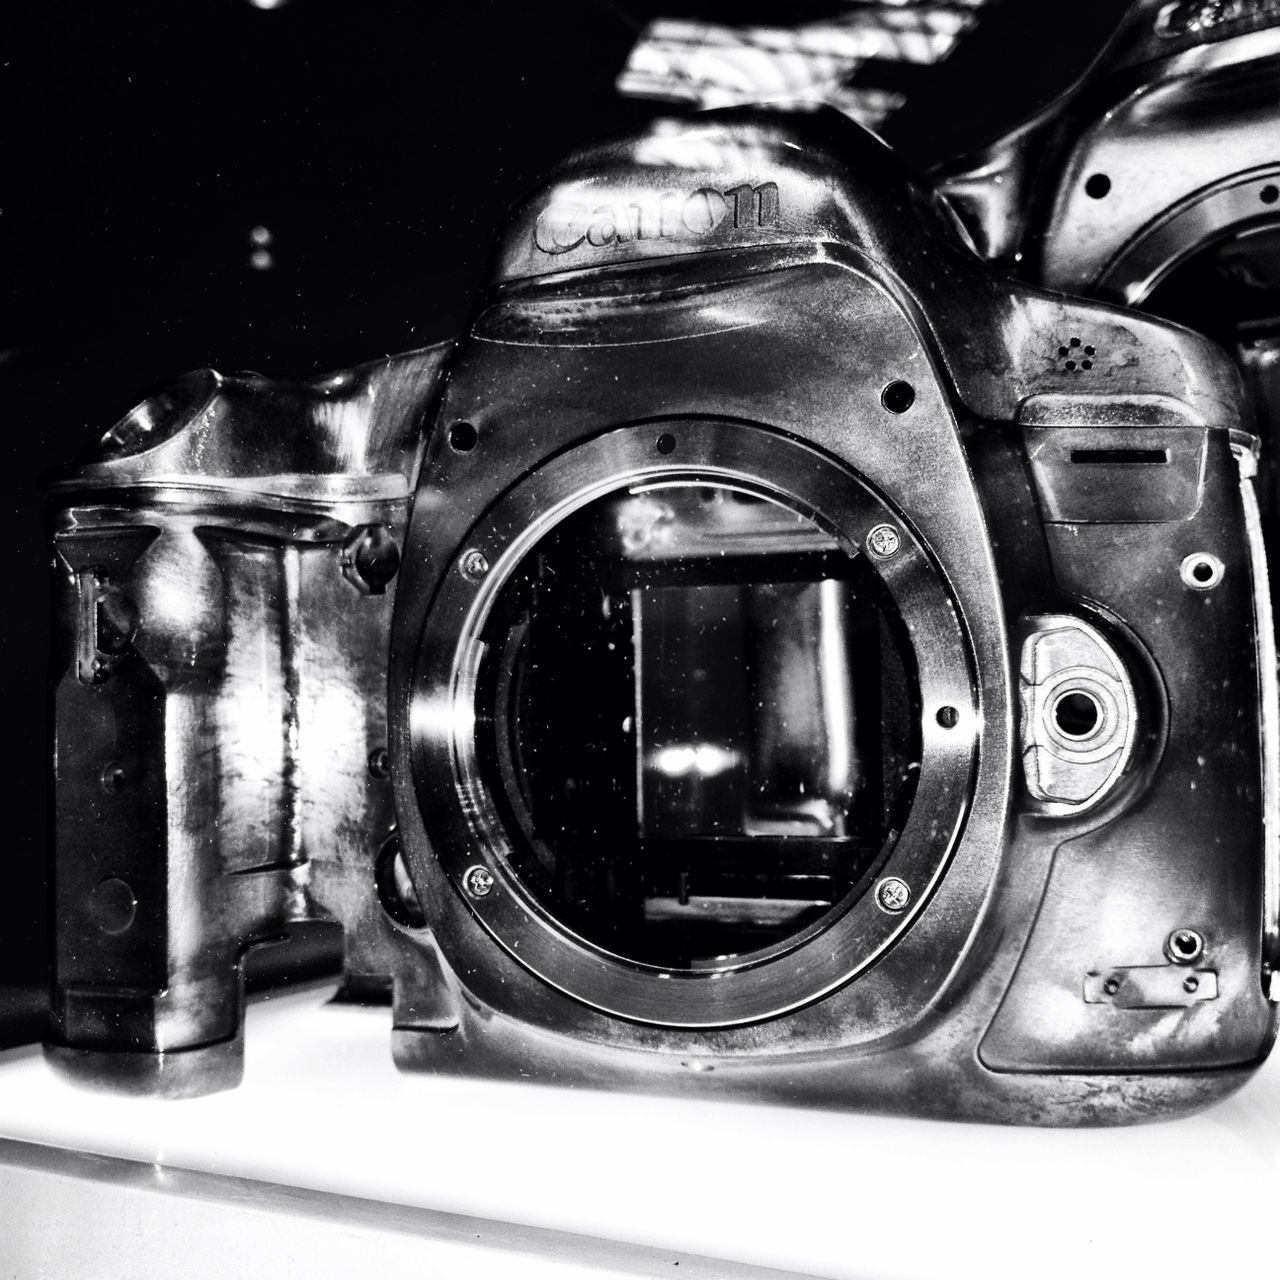 Terminator - Canon EOS 5d MKiii